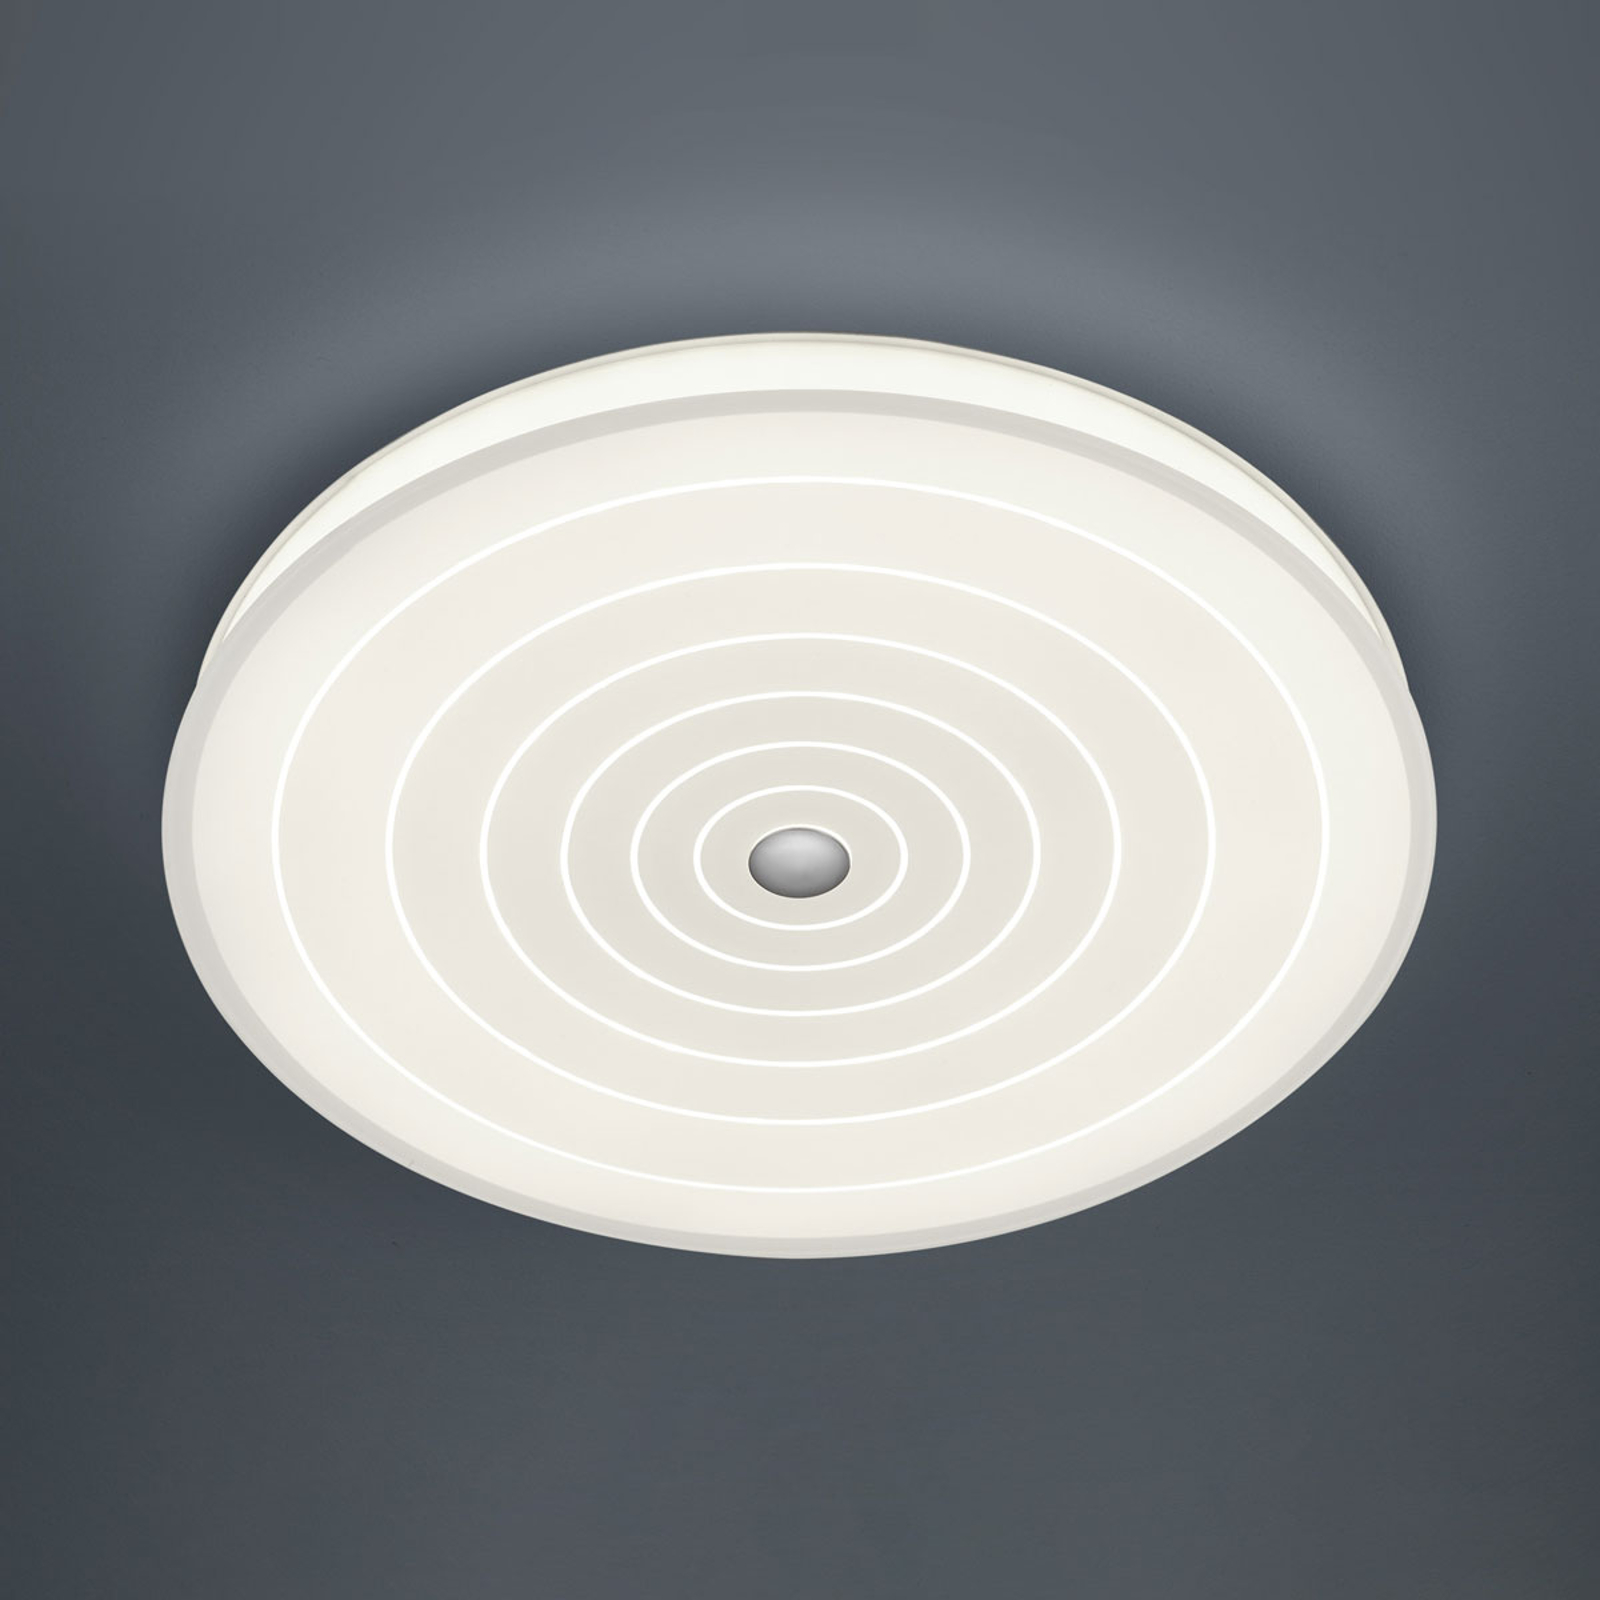 BANKAMP Mandala LED-loftlampe, cirkel, Ø 42 cm